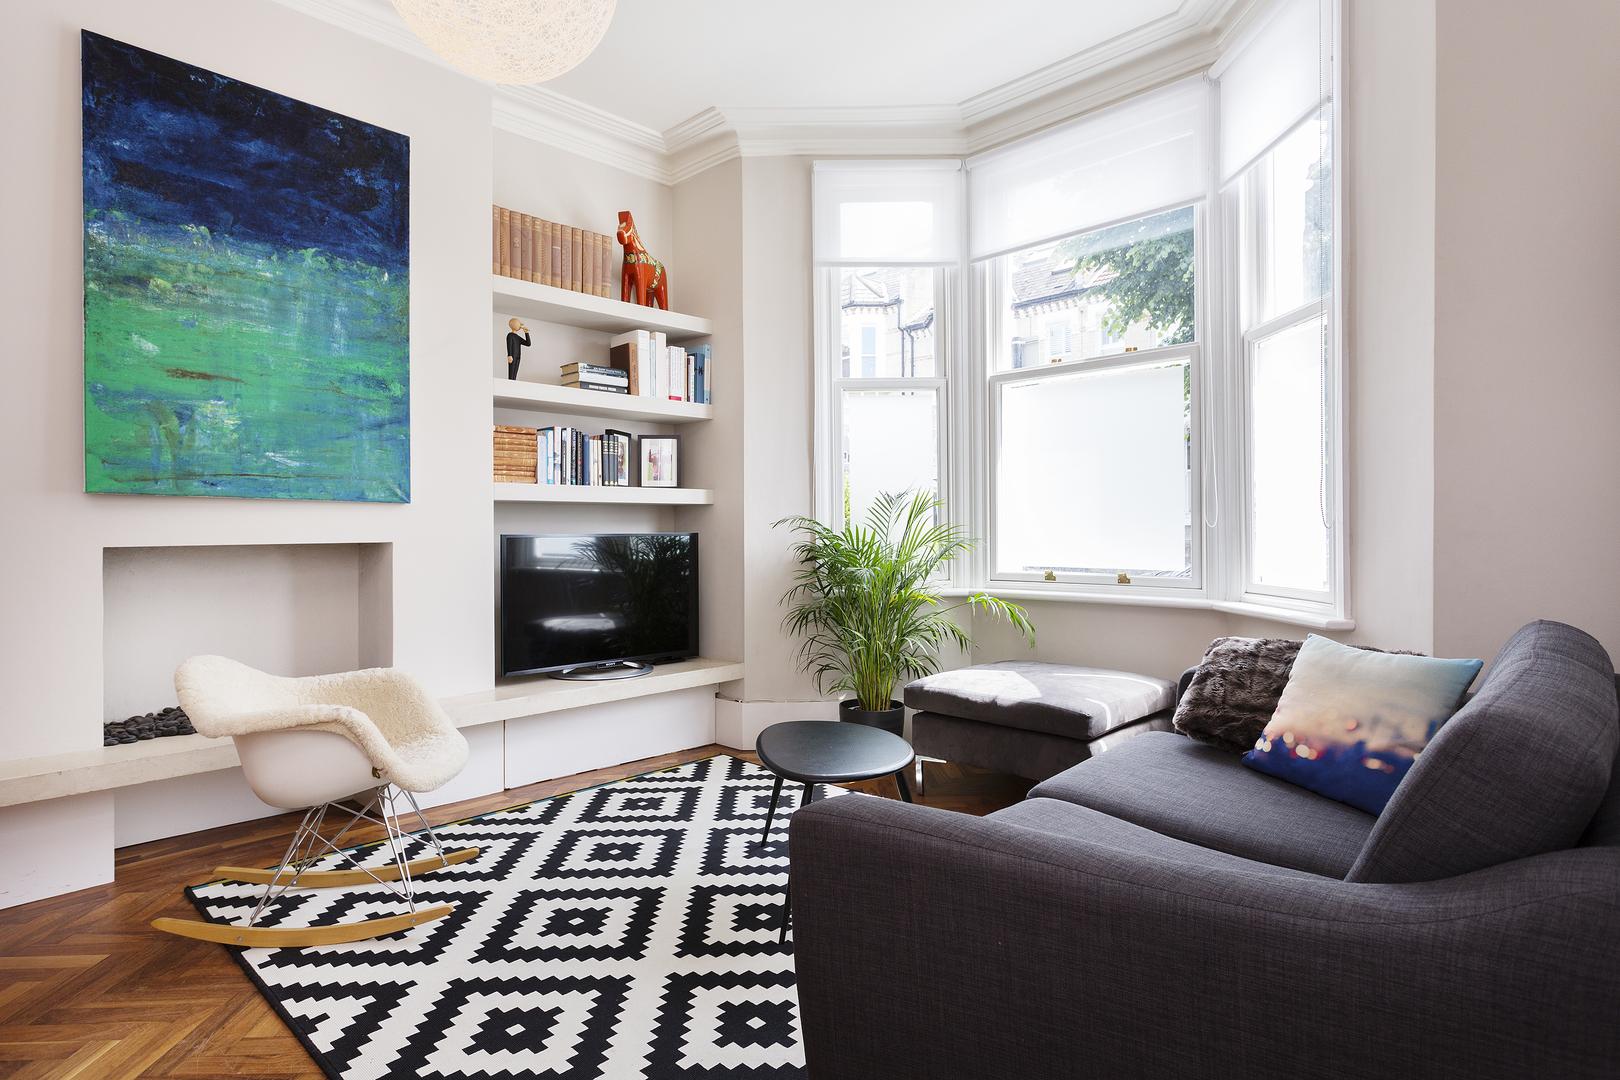 Luxury accommodation in London